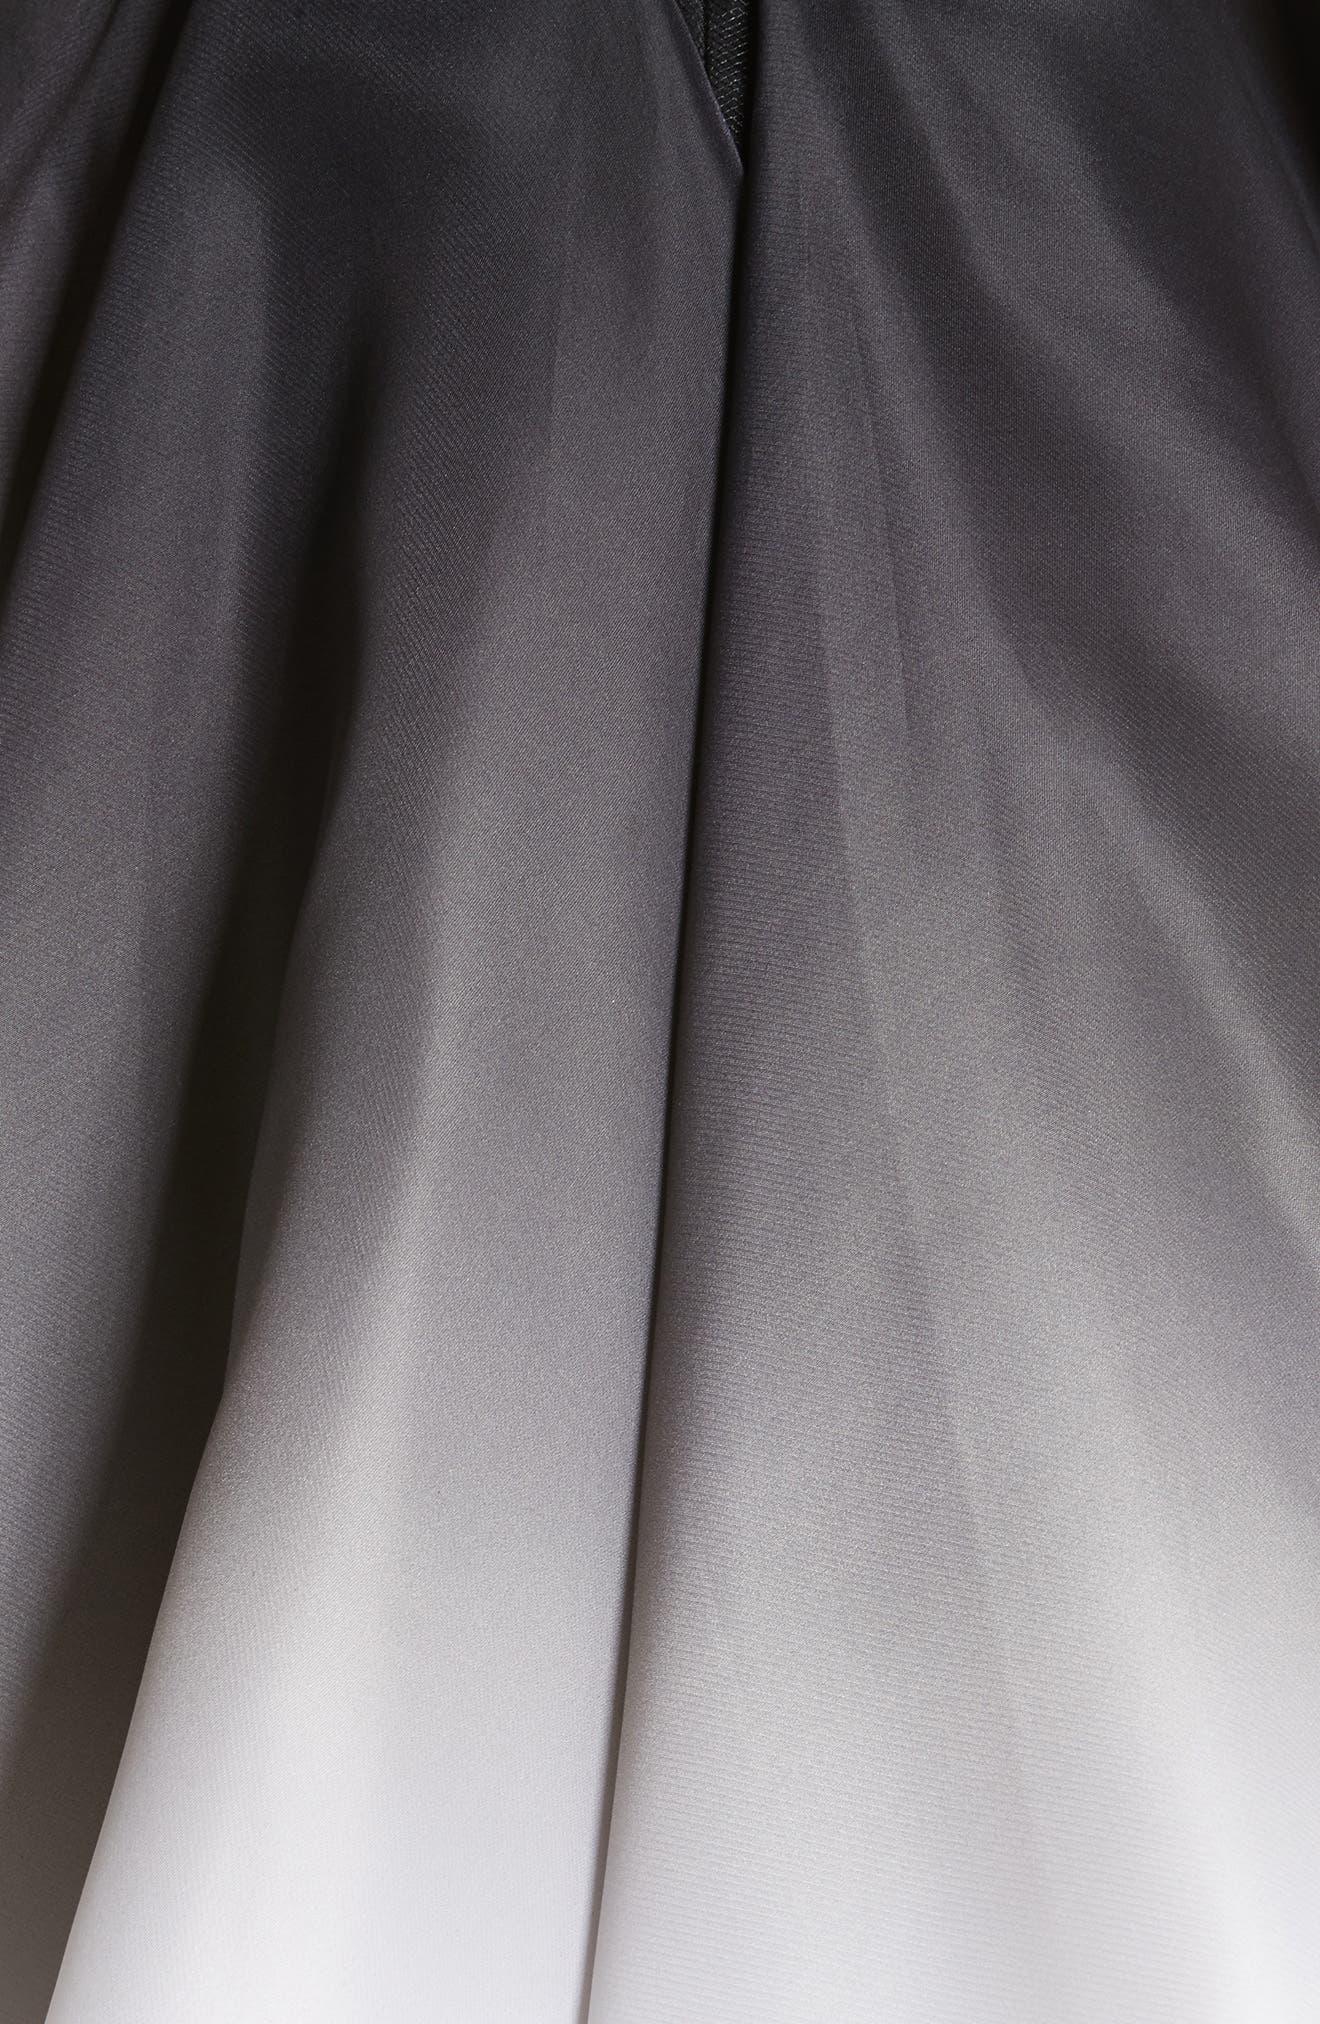 Ombré Strapless Tea Length Dress,                             Alternate thumbnail 6, color,                             Black/ White